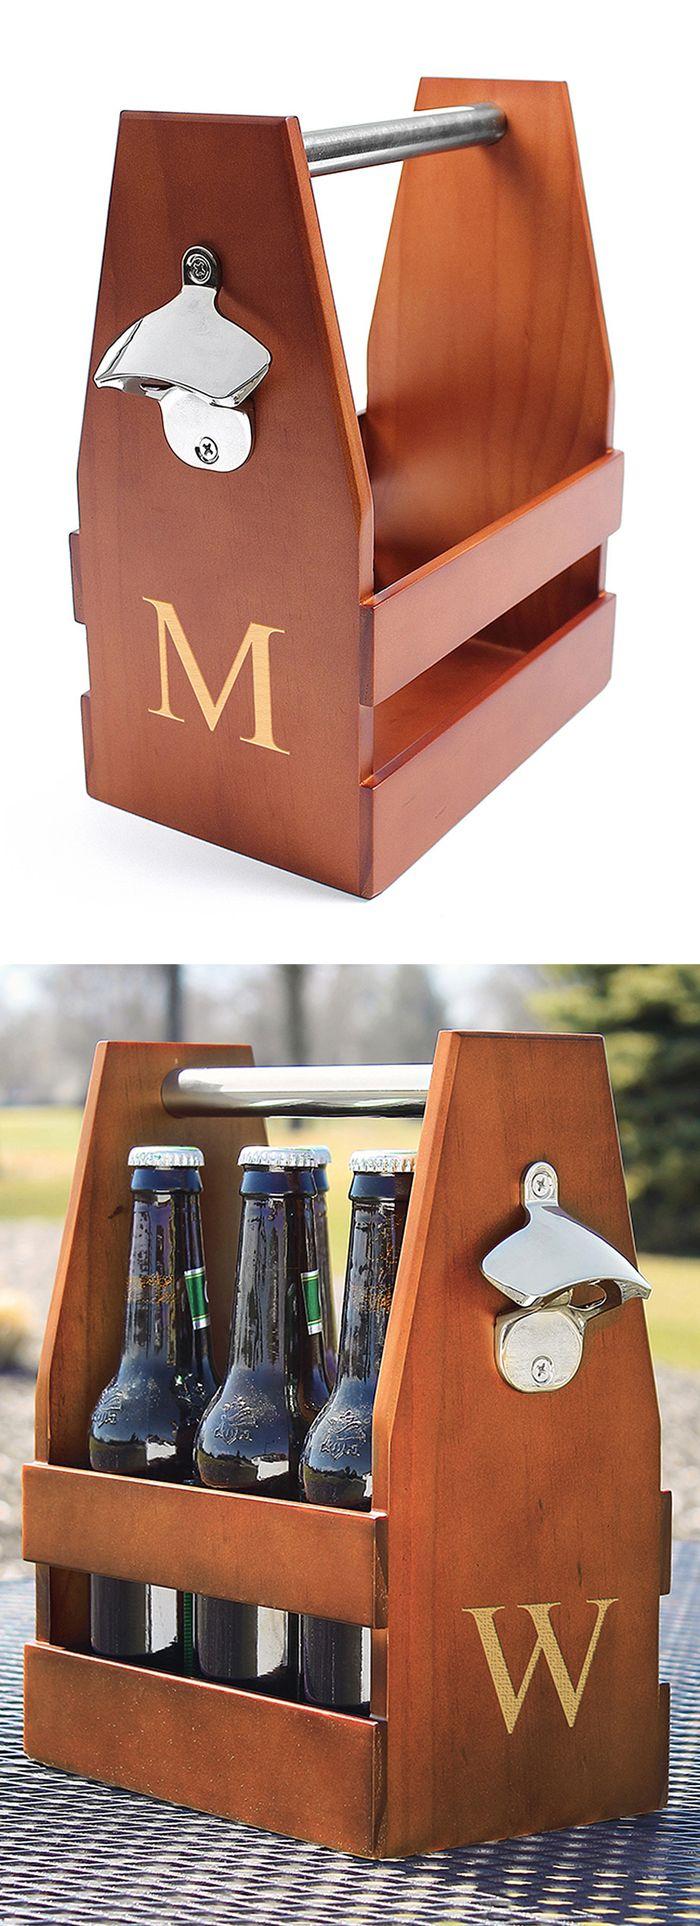 Craft beer carrier // with built-in bottle opener! #product_design